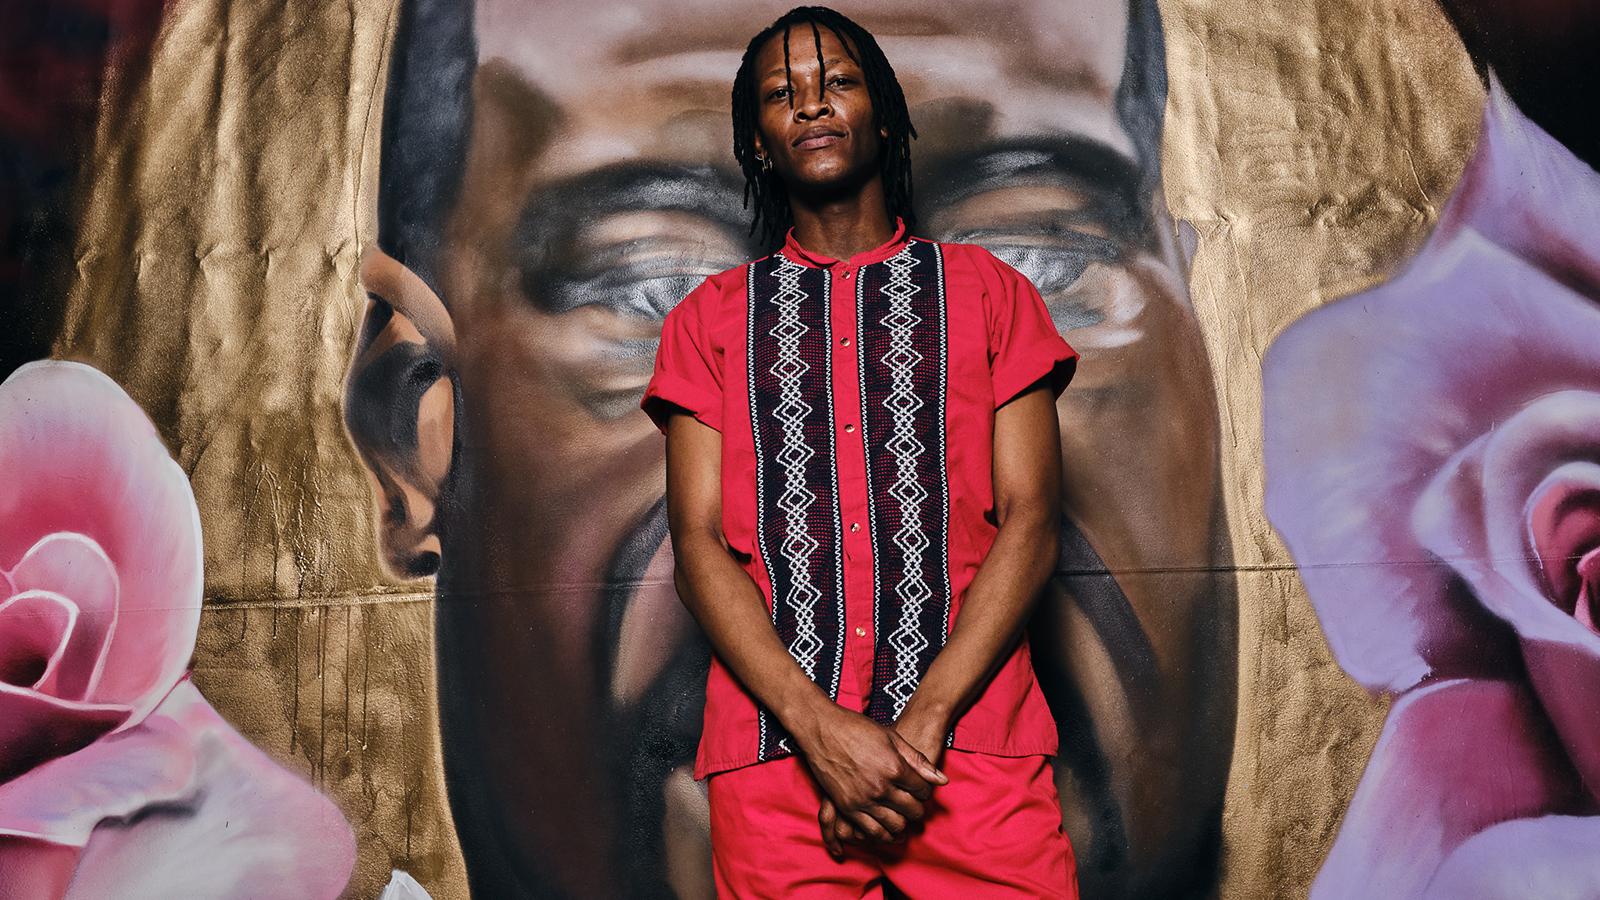 The Sound of (Black) Music] Vuyo Sotashe by Oluwaseye Olusa